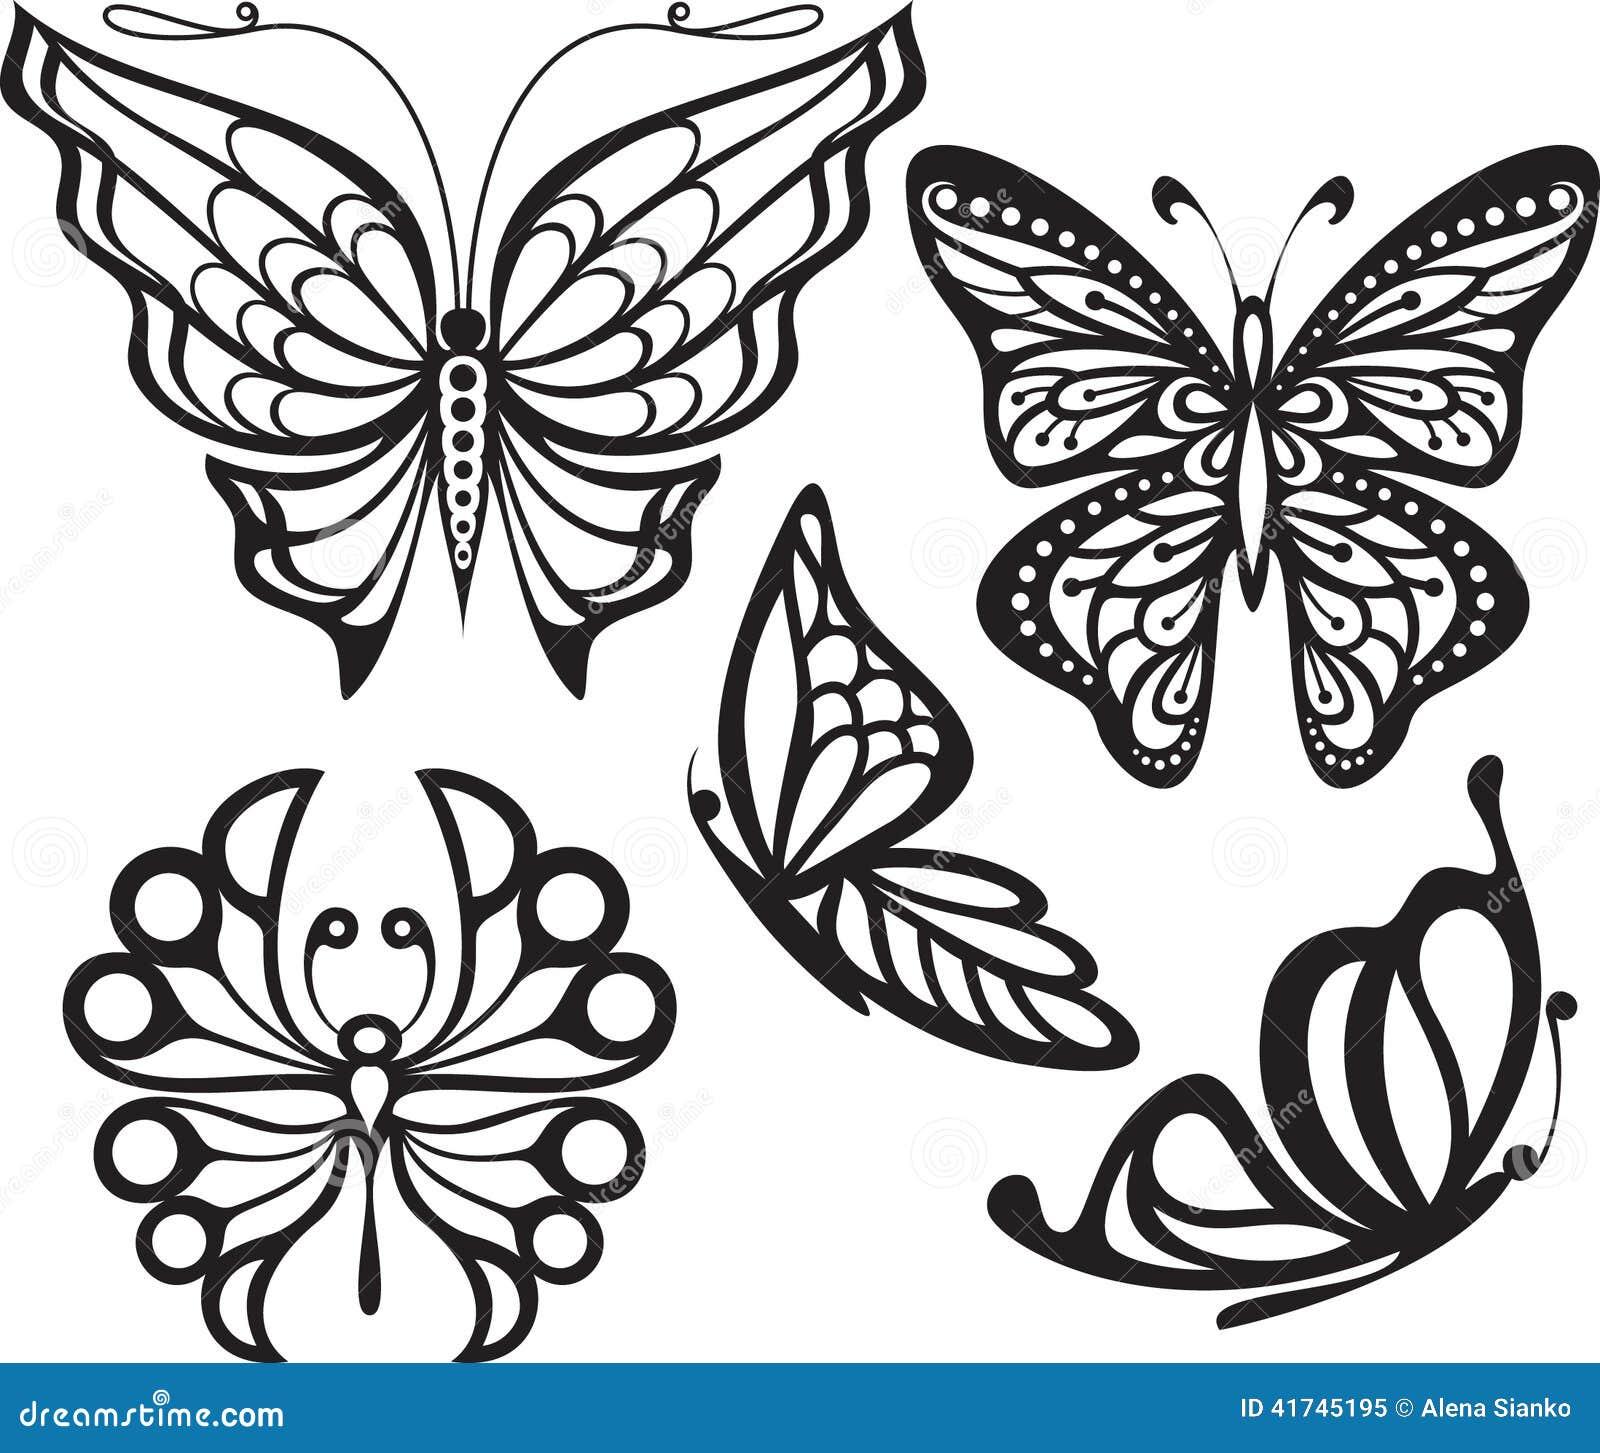 Dibujos De Mariposas Para Tatuar - Galerie Tatouage